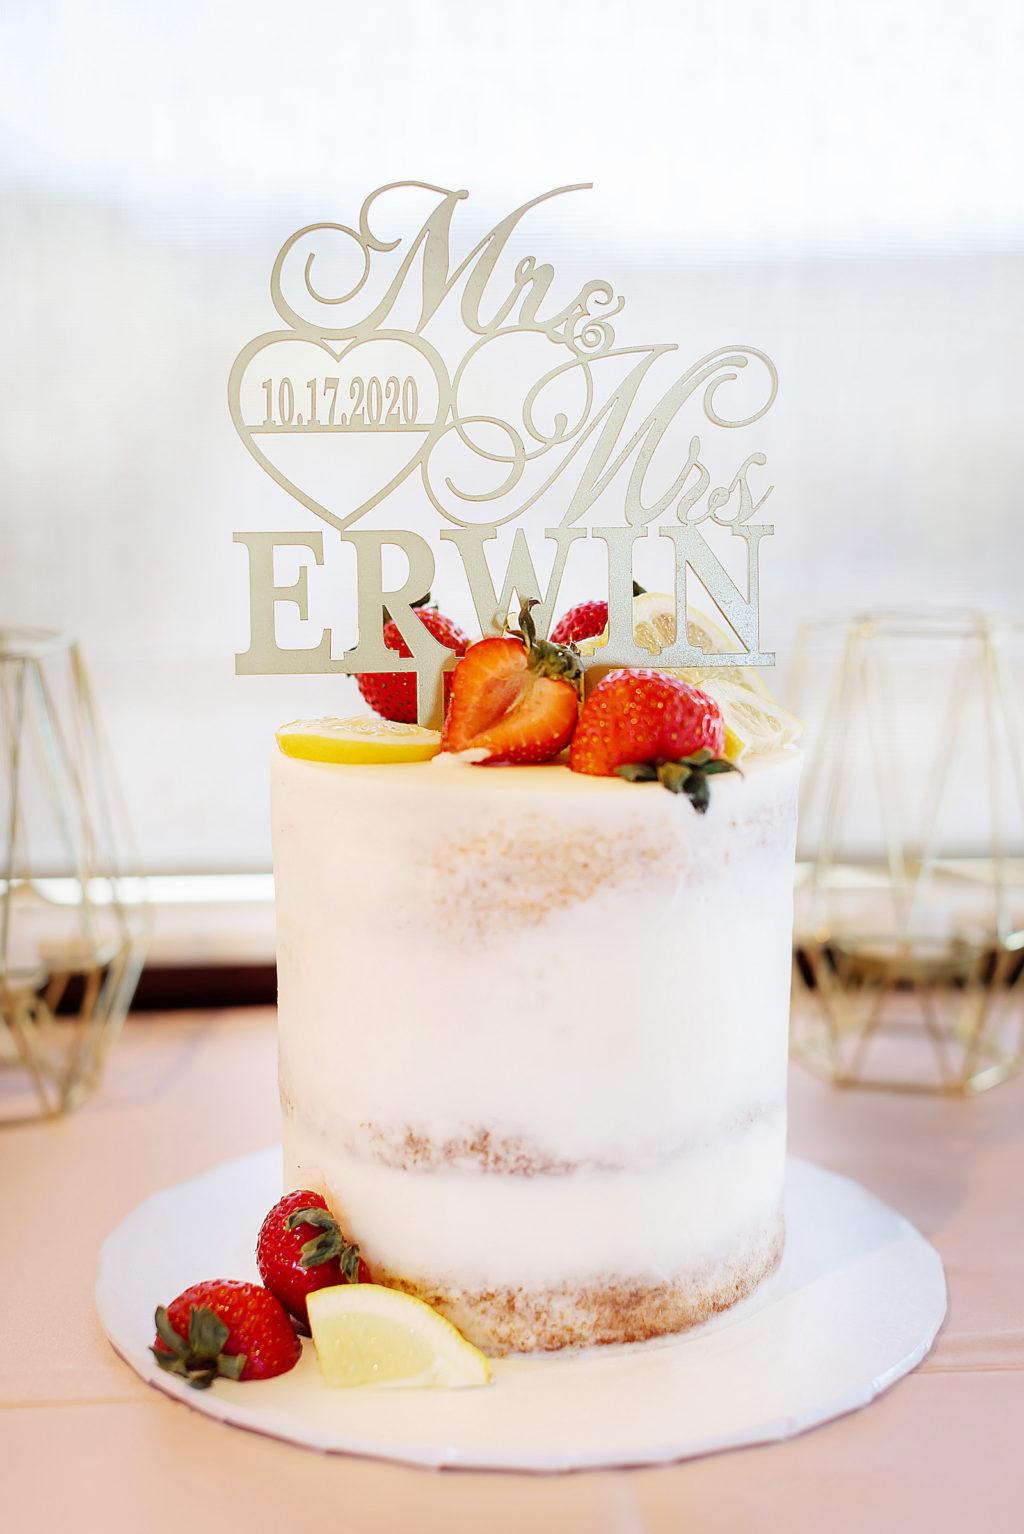 White Semi Naked One Tier Wedding Cake with Strawberries and Lemon Slices, Custom Laser Cut Cake Topper   Tampa Bay Wedding Cake The Cake Girl   Wedding Photographer Limelight Photography